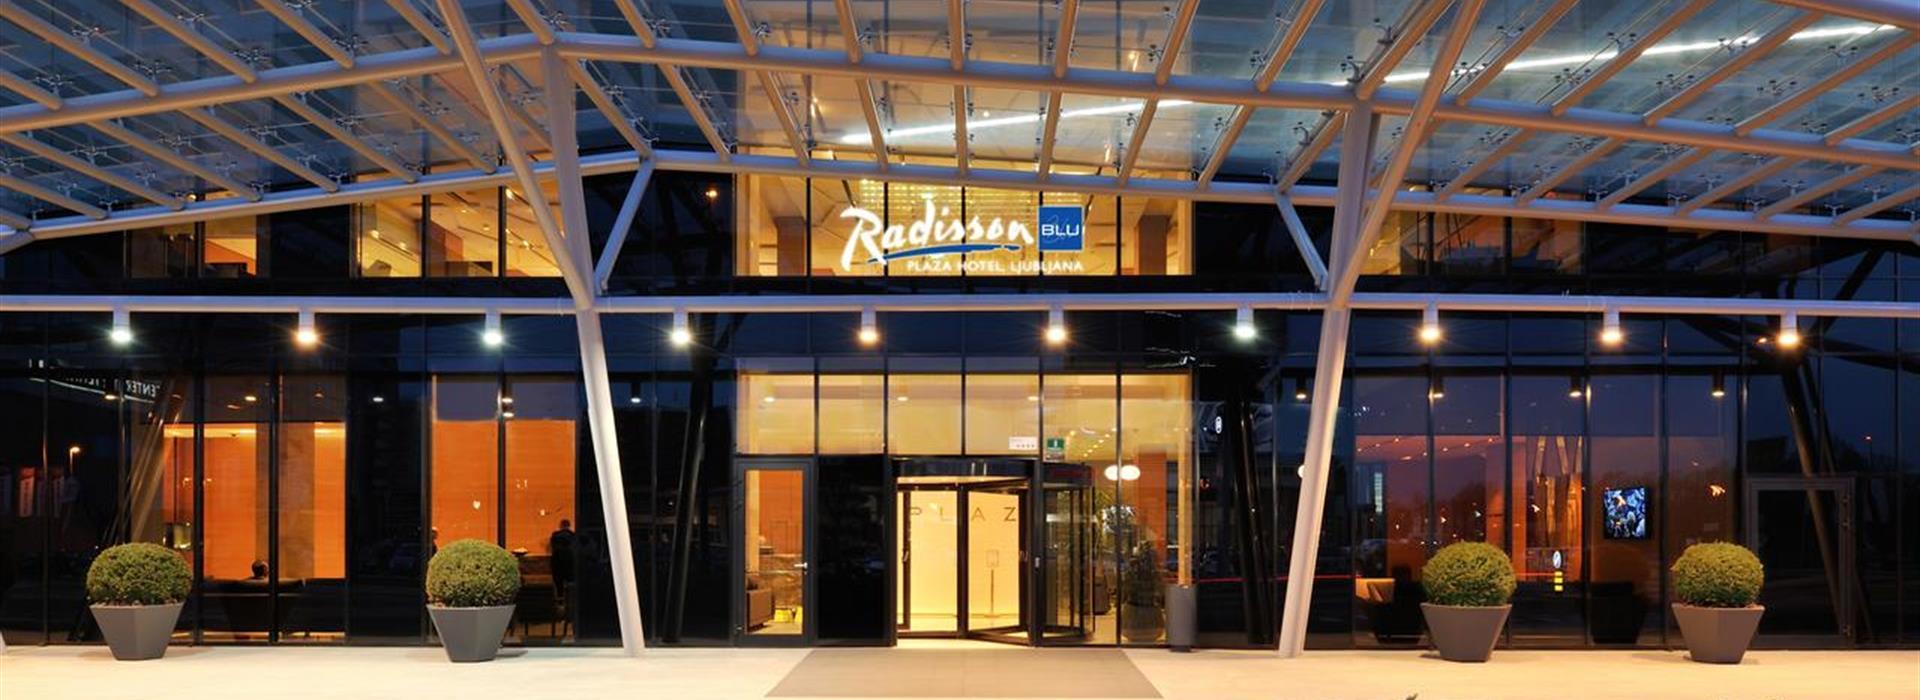 radisson-blu-plaza-hotel-ljubljana